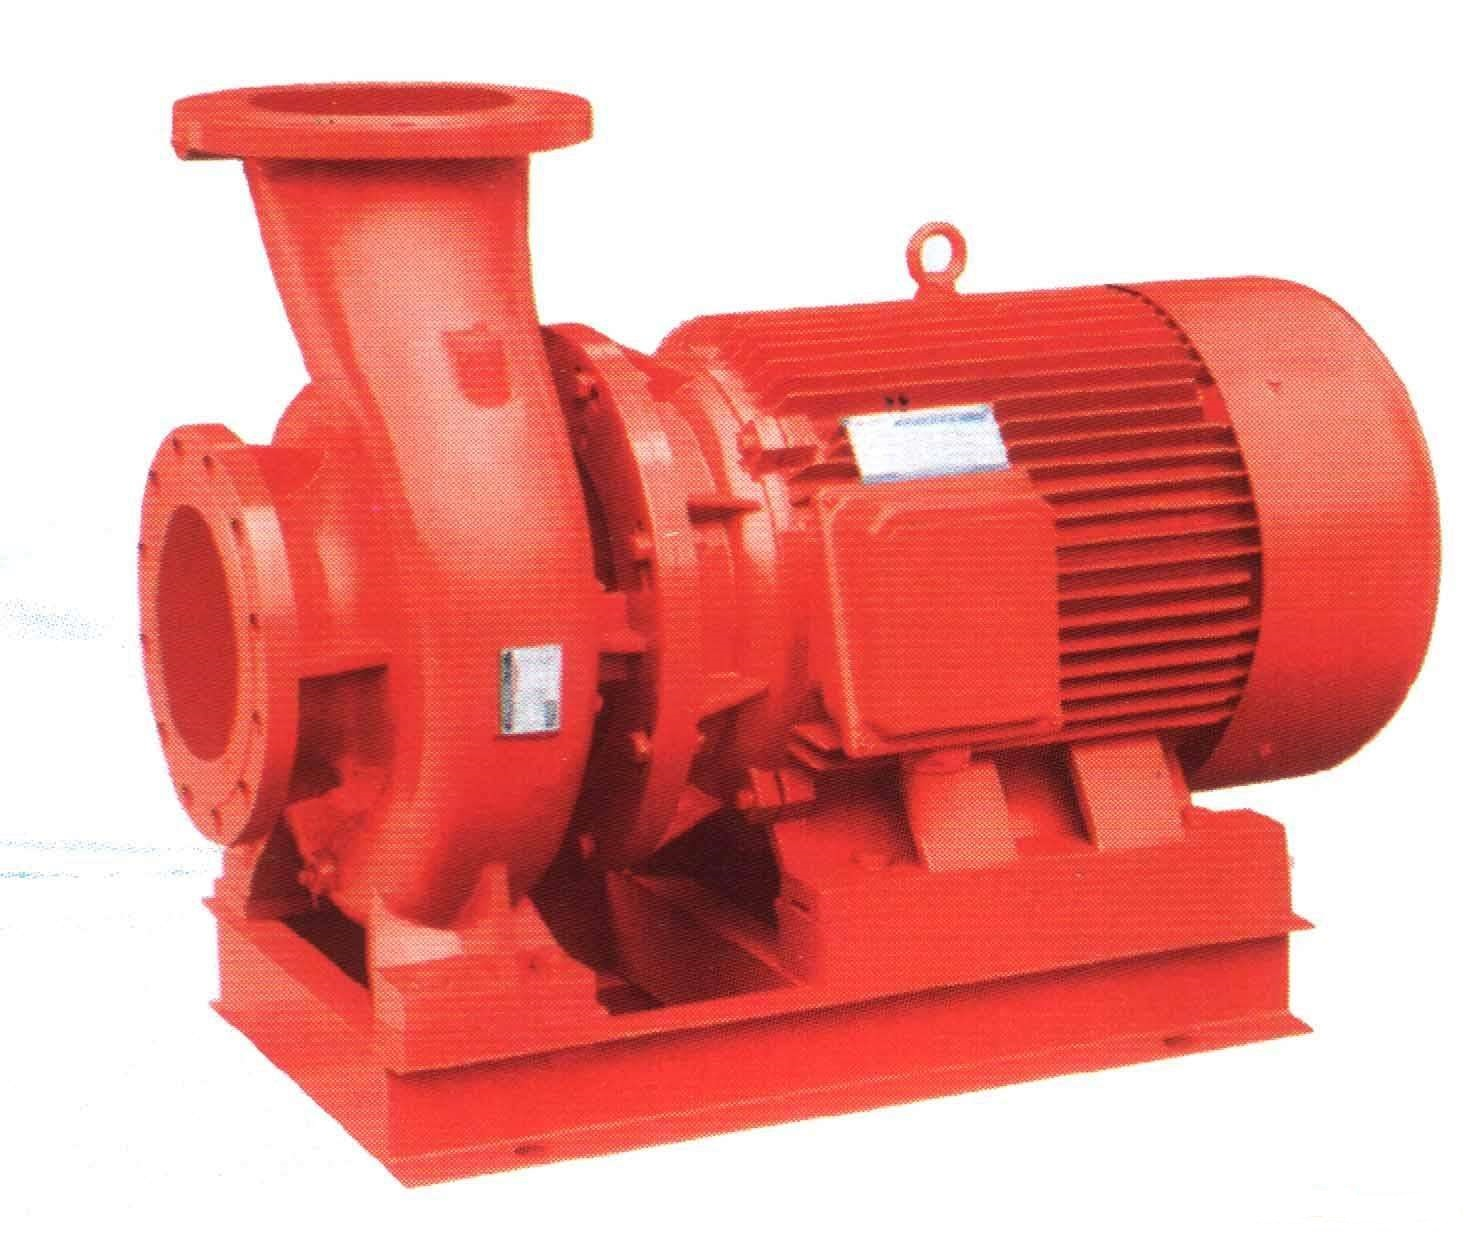 消火栓<em style='color:red'>加压泵</em>图片